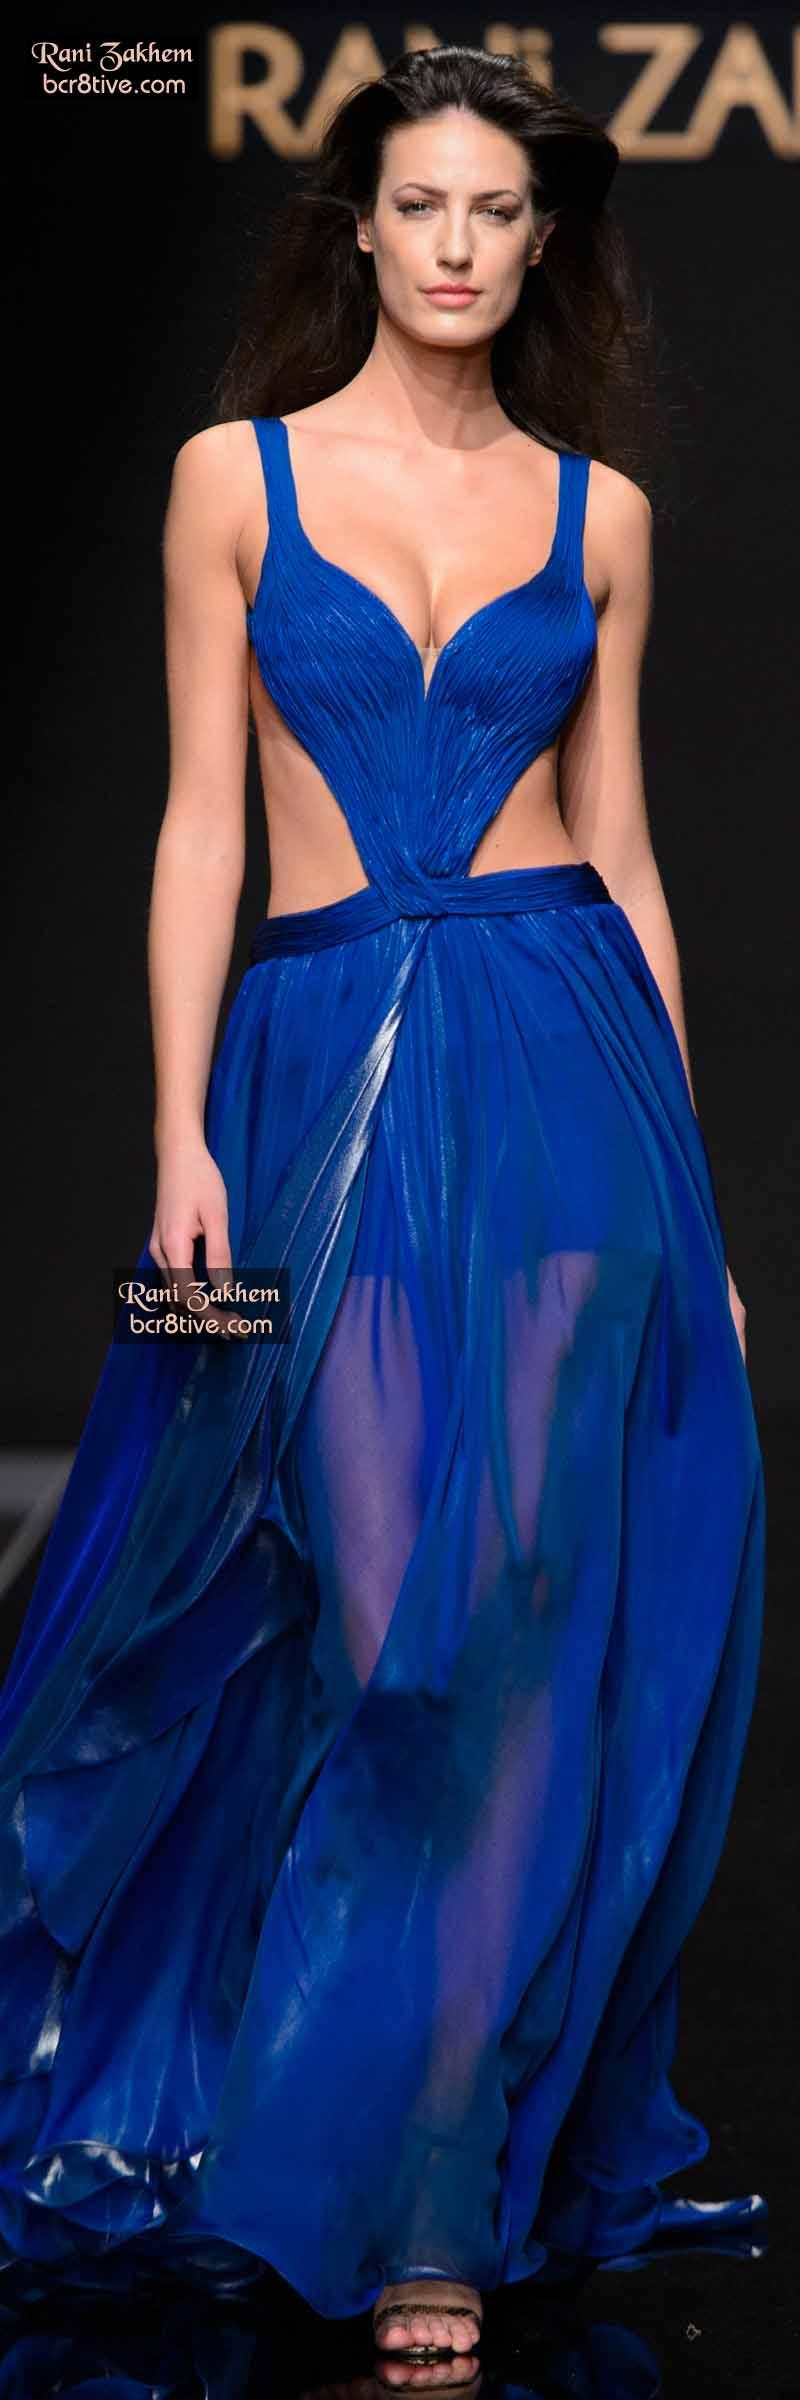 Rani Zakhem Spring 2015 Haute Couture